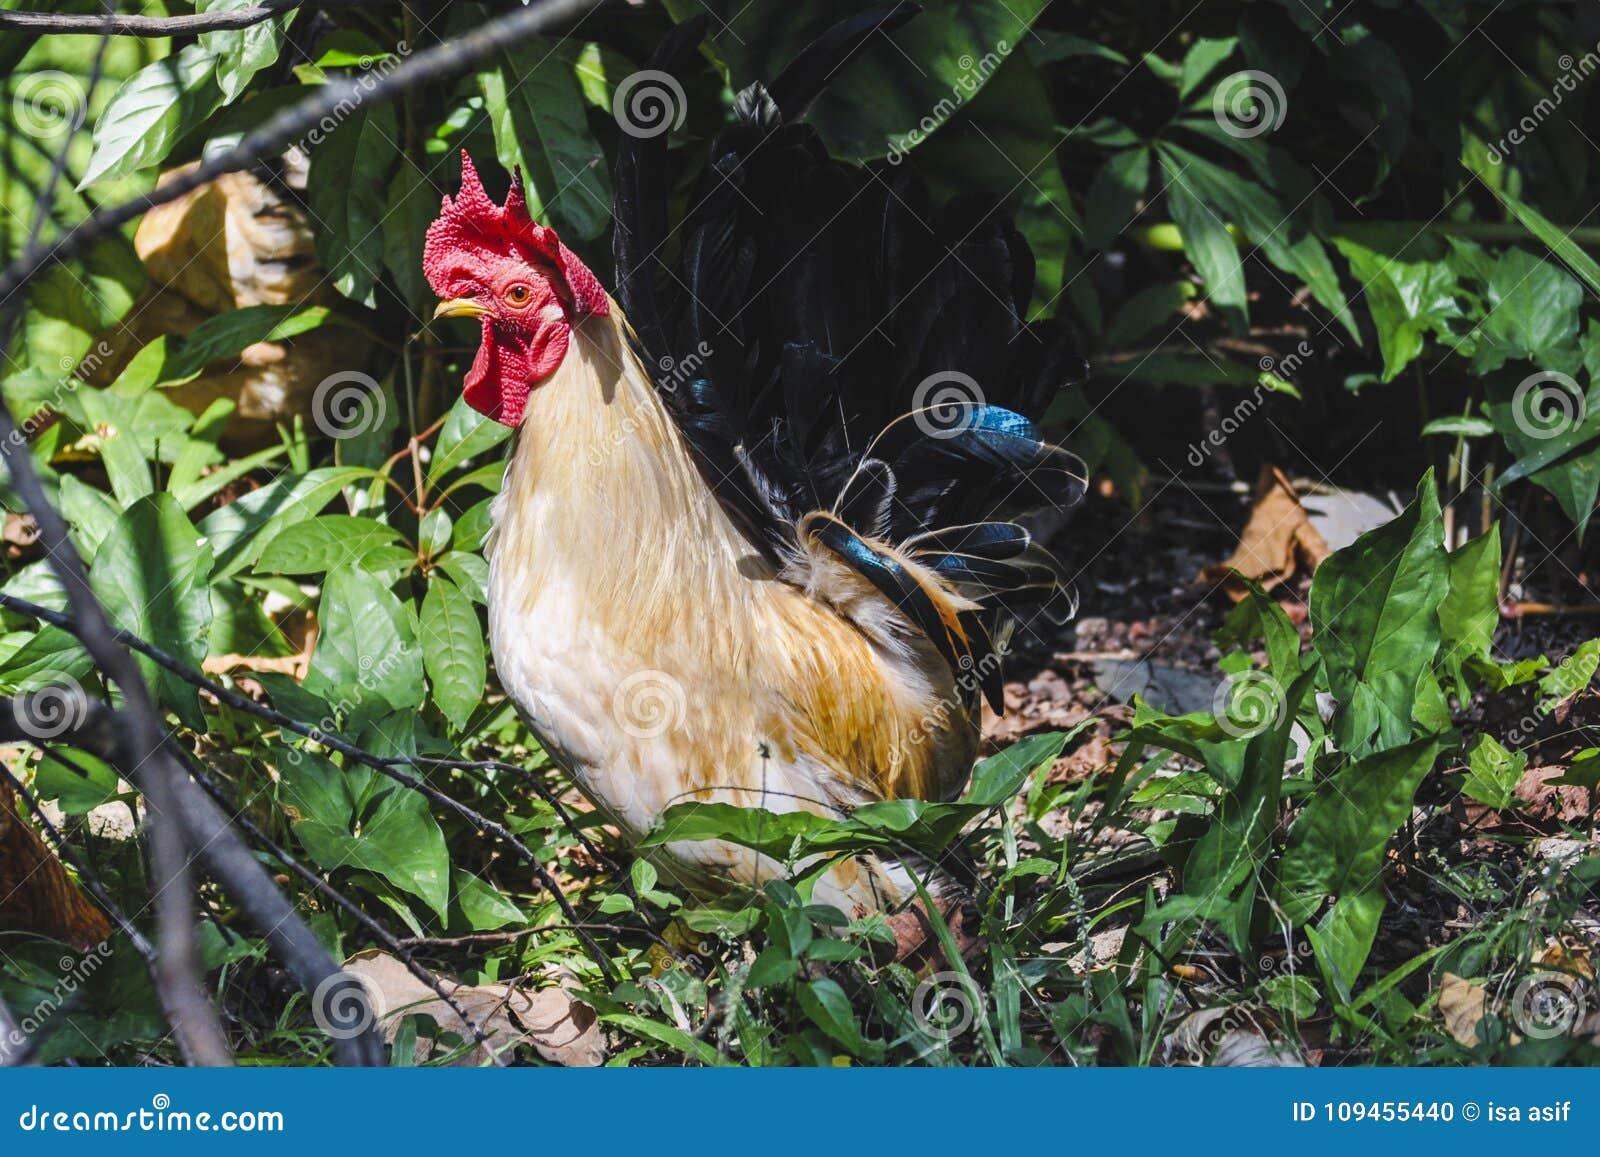 Jugle cock chicken